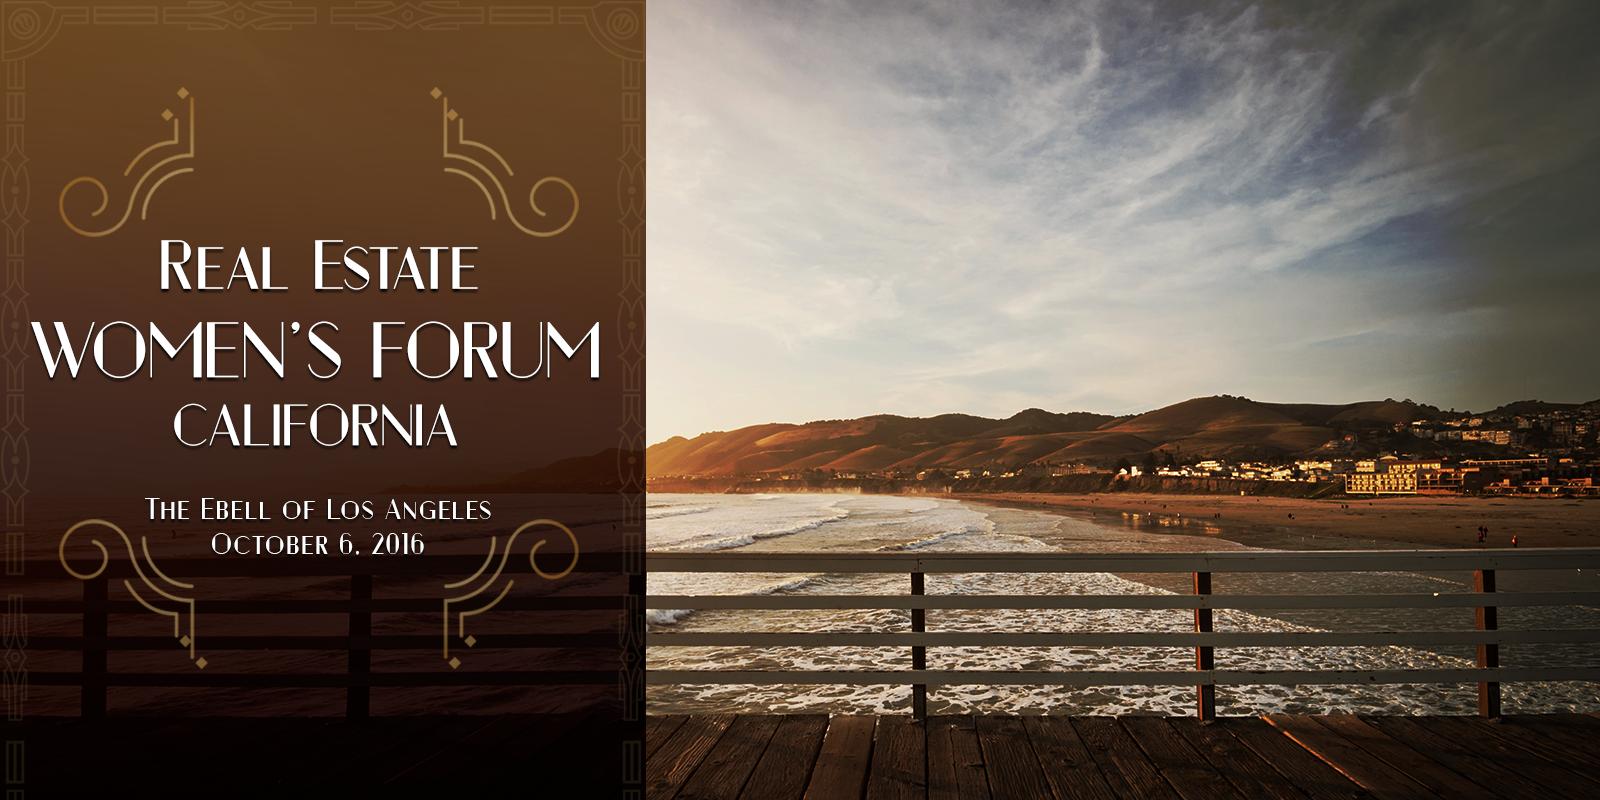 Real Estate Women's Forum California